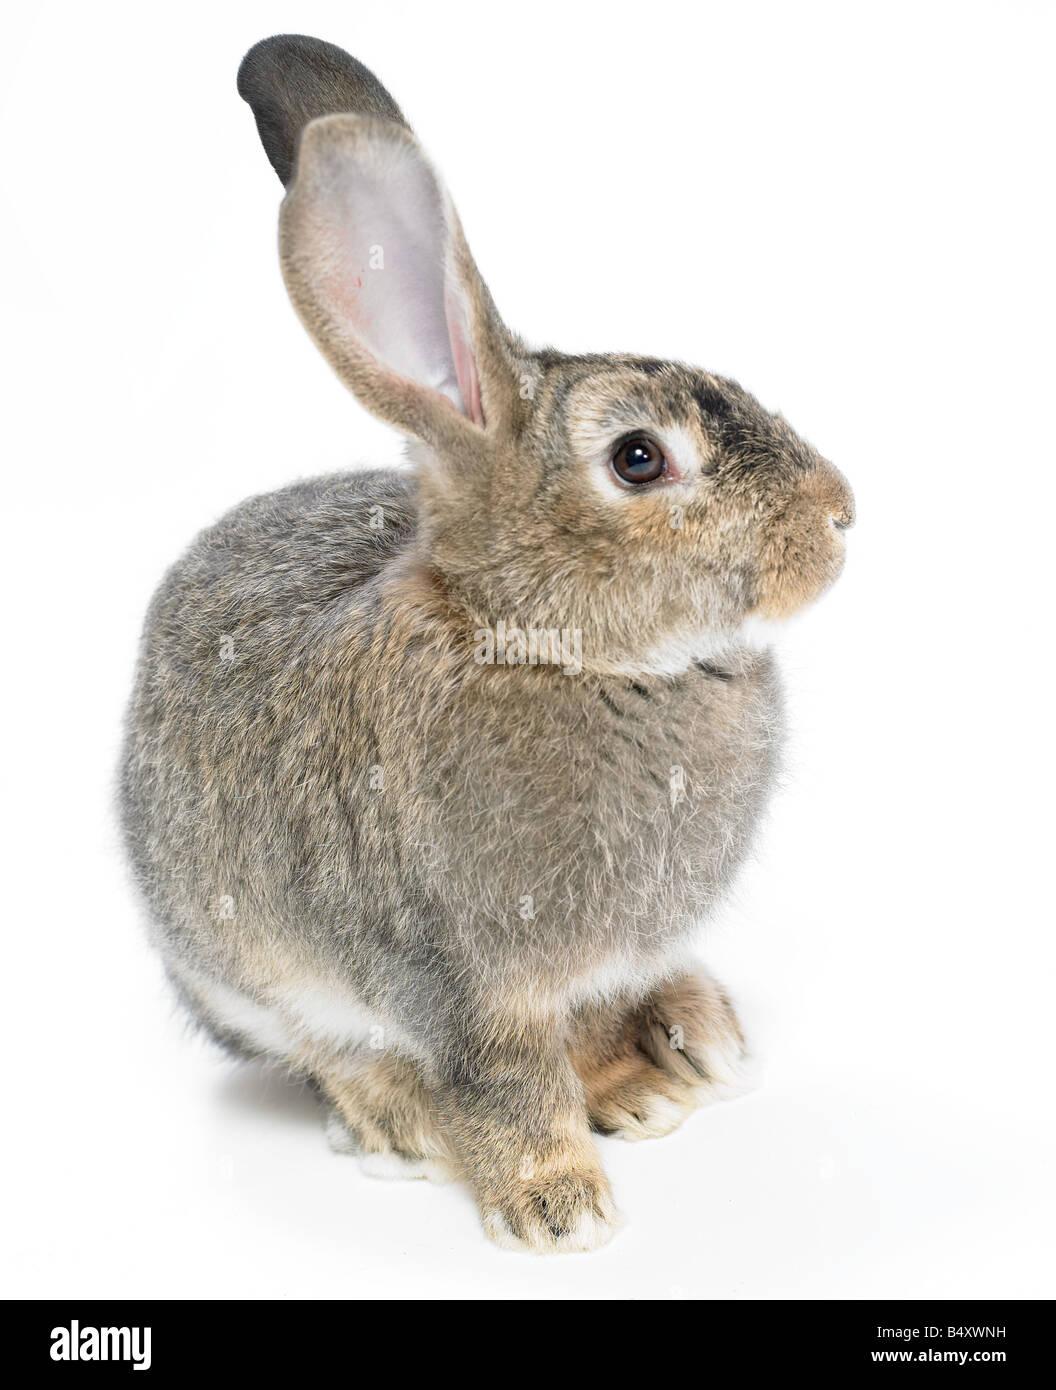 Wild,domestic rabbit on white background.Cutout. - Stock Image